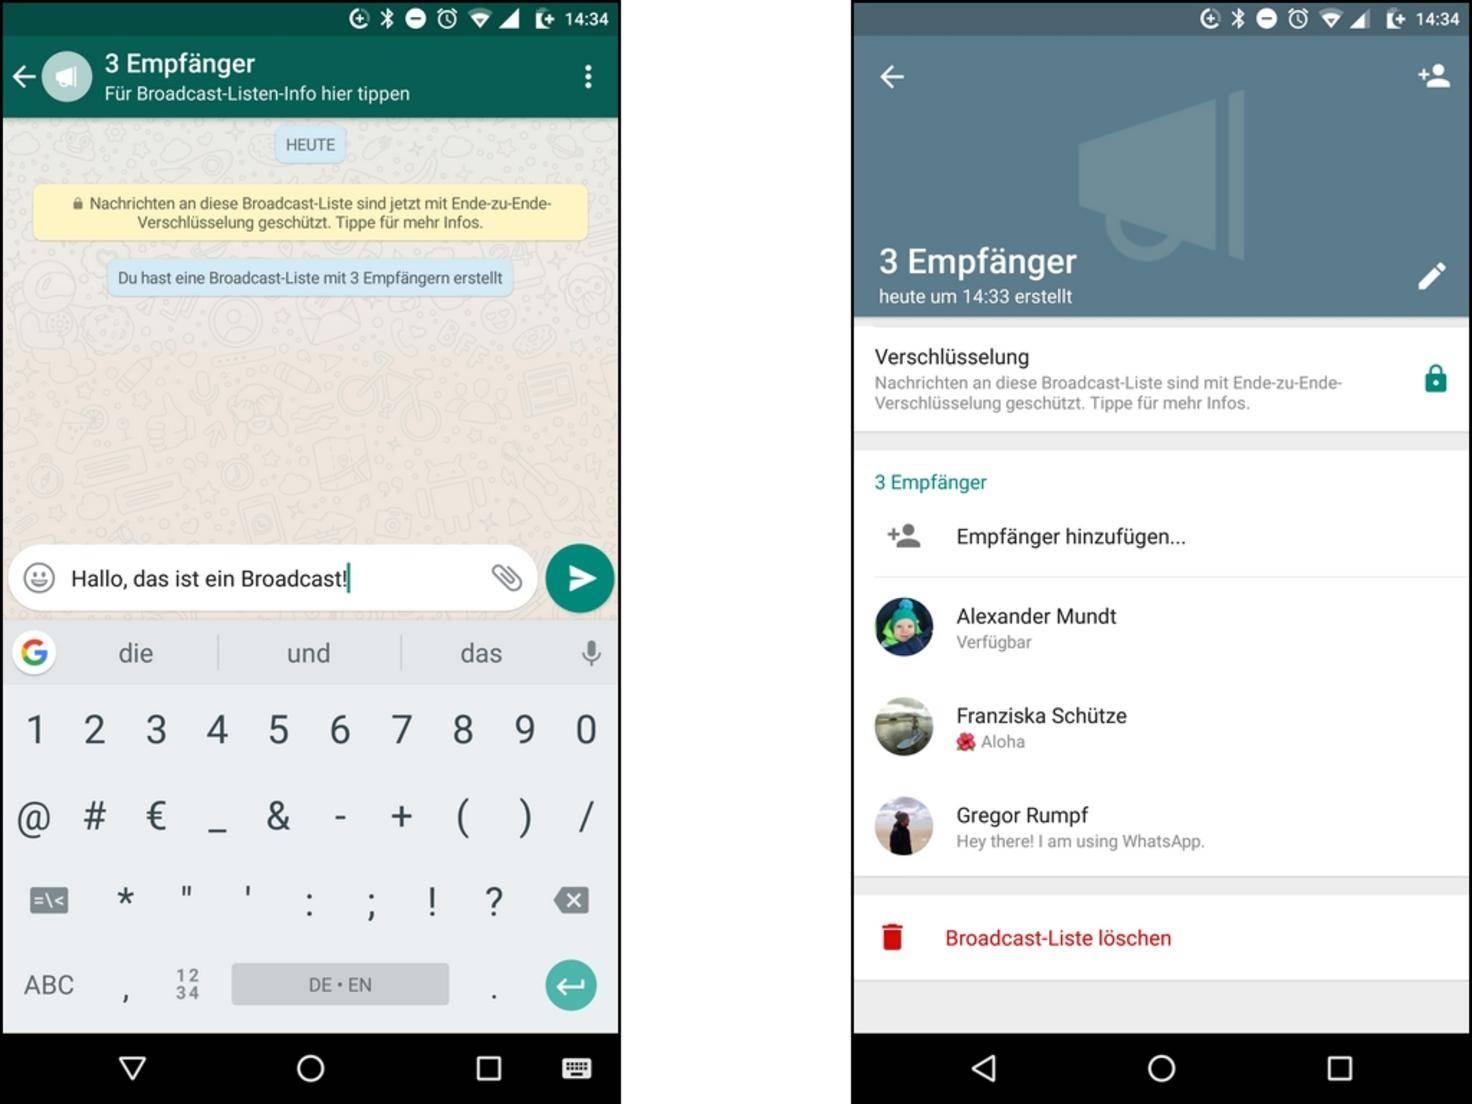 WhatsApp-Broadcast kommt nicht an? Das ist zu beachten